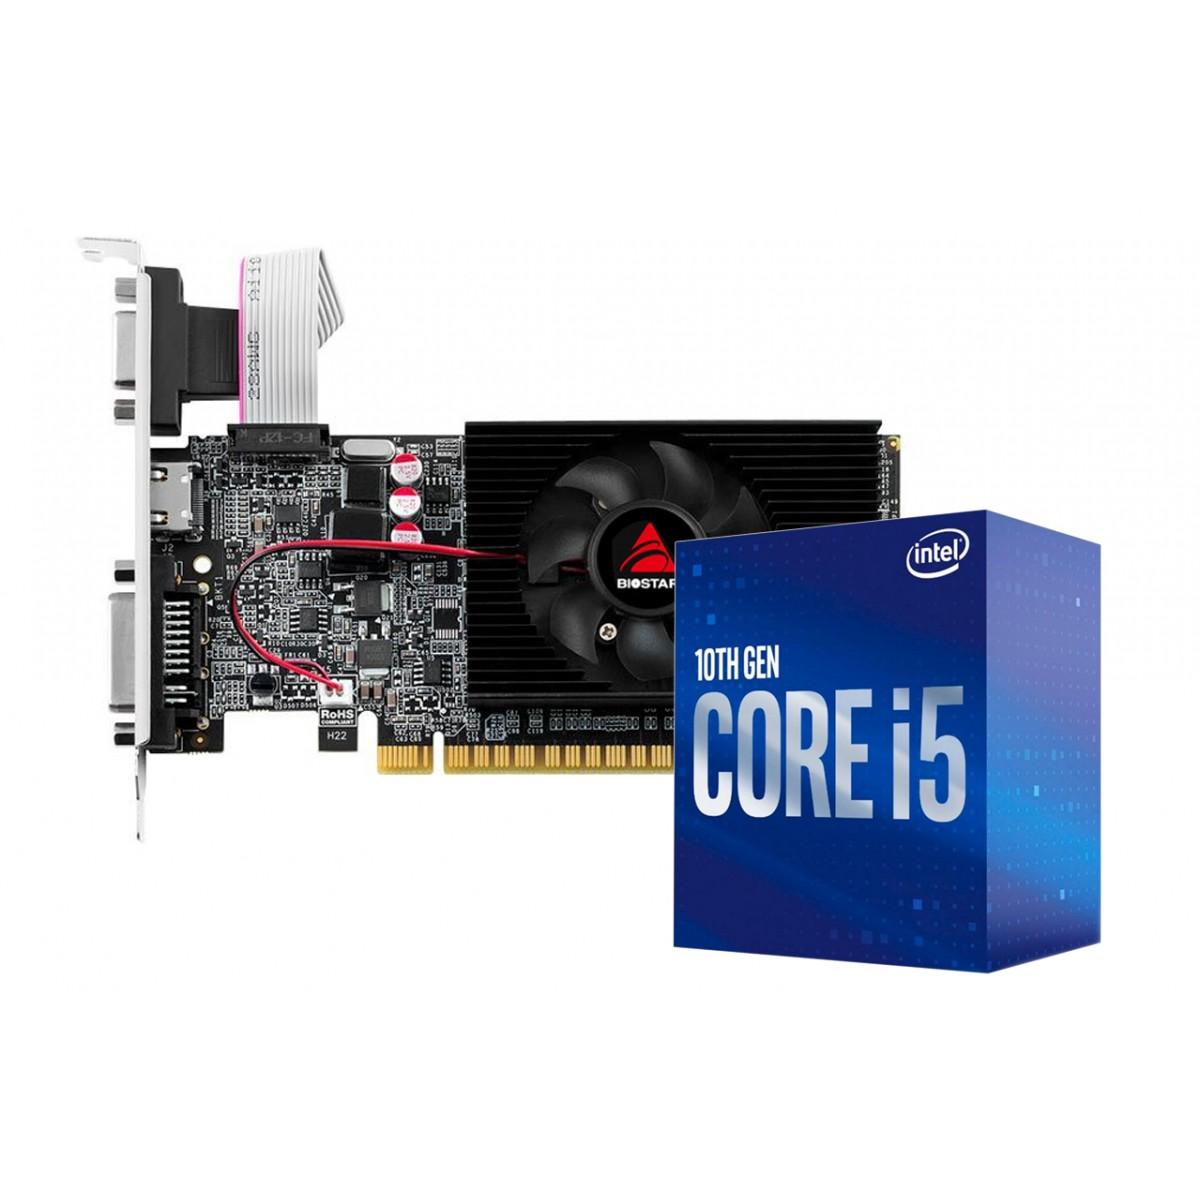 Kit Upgrade Biostar NVIDIA GeForce GT 710 2GB + Processador Intel Core i5 10400F